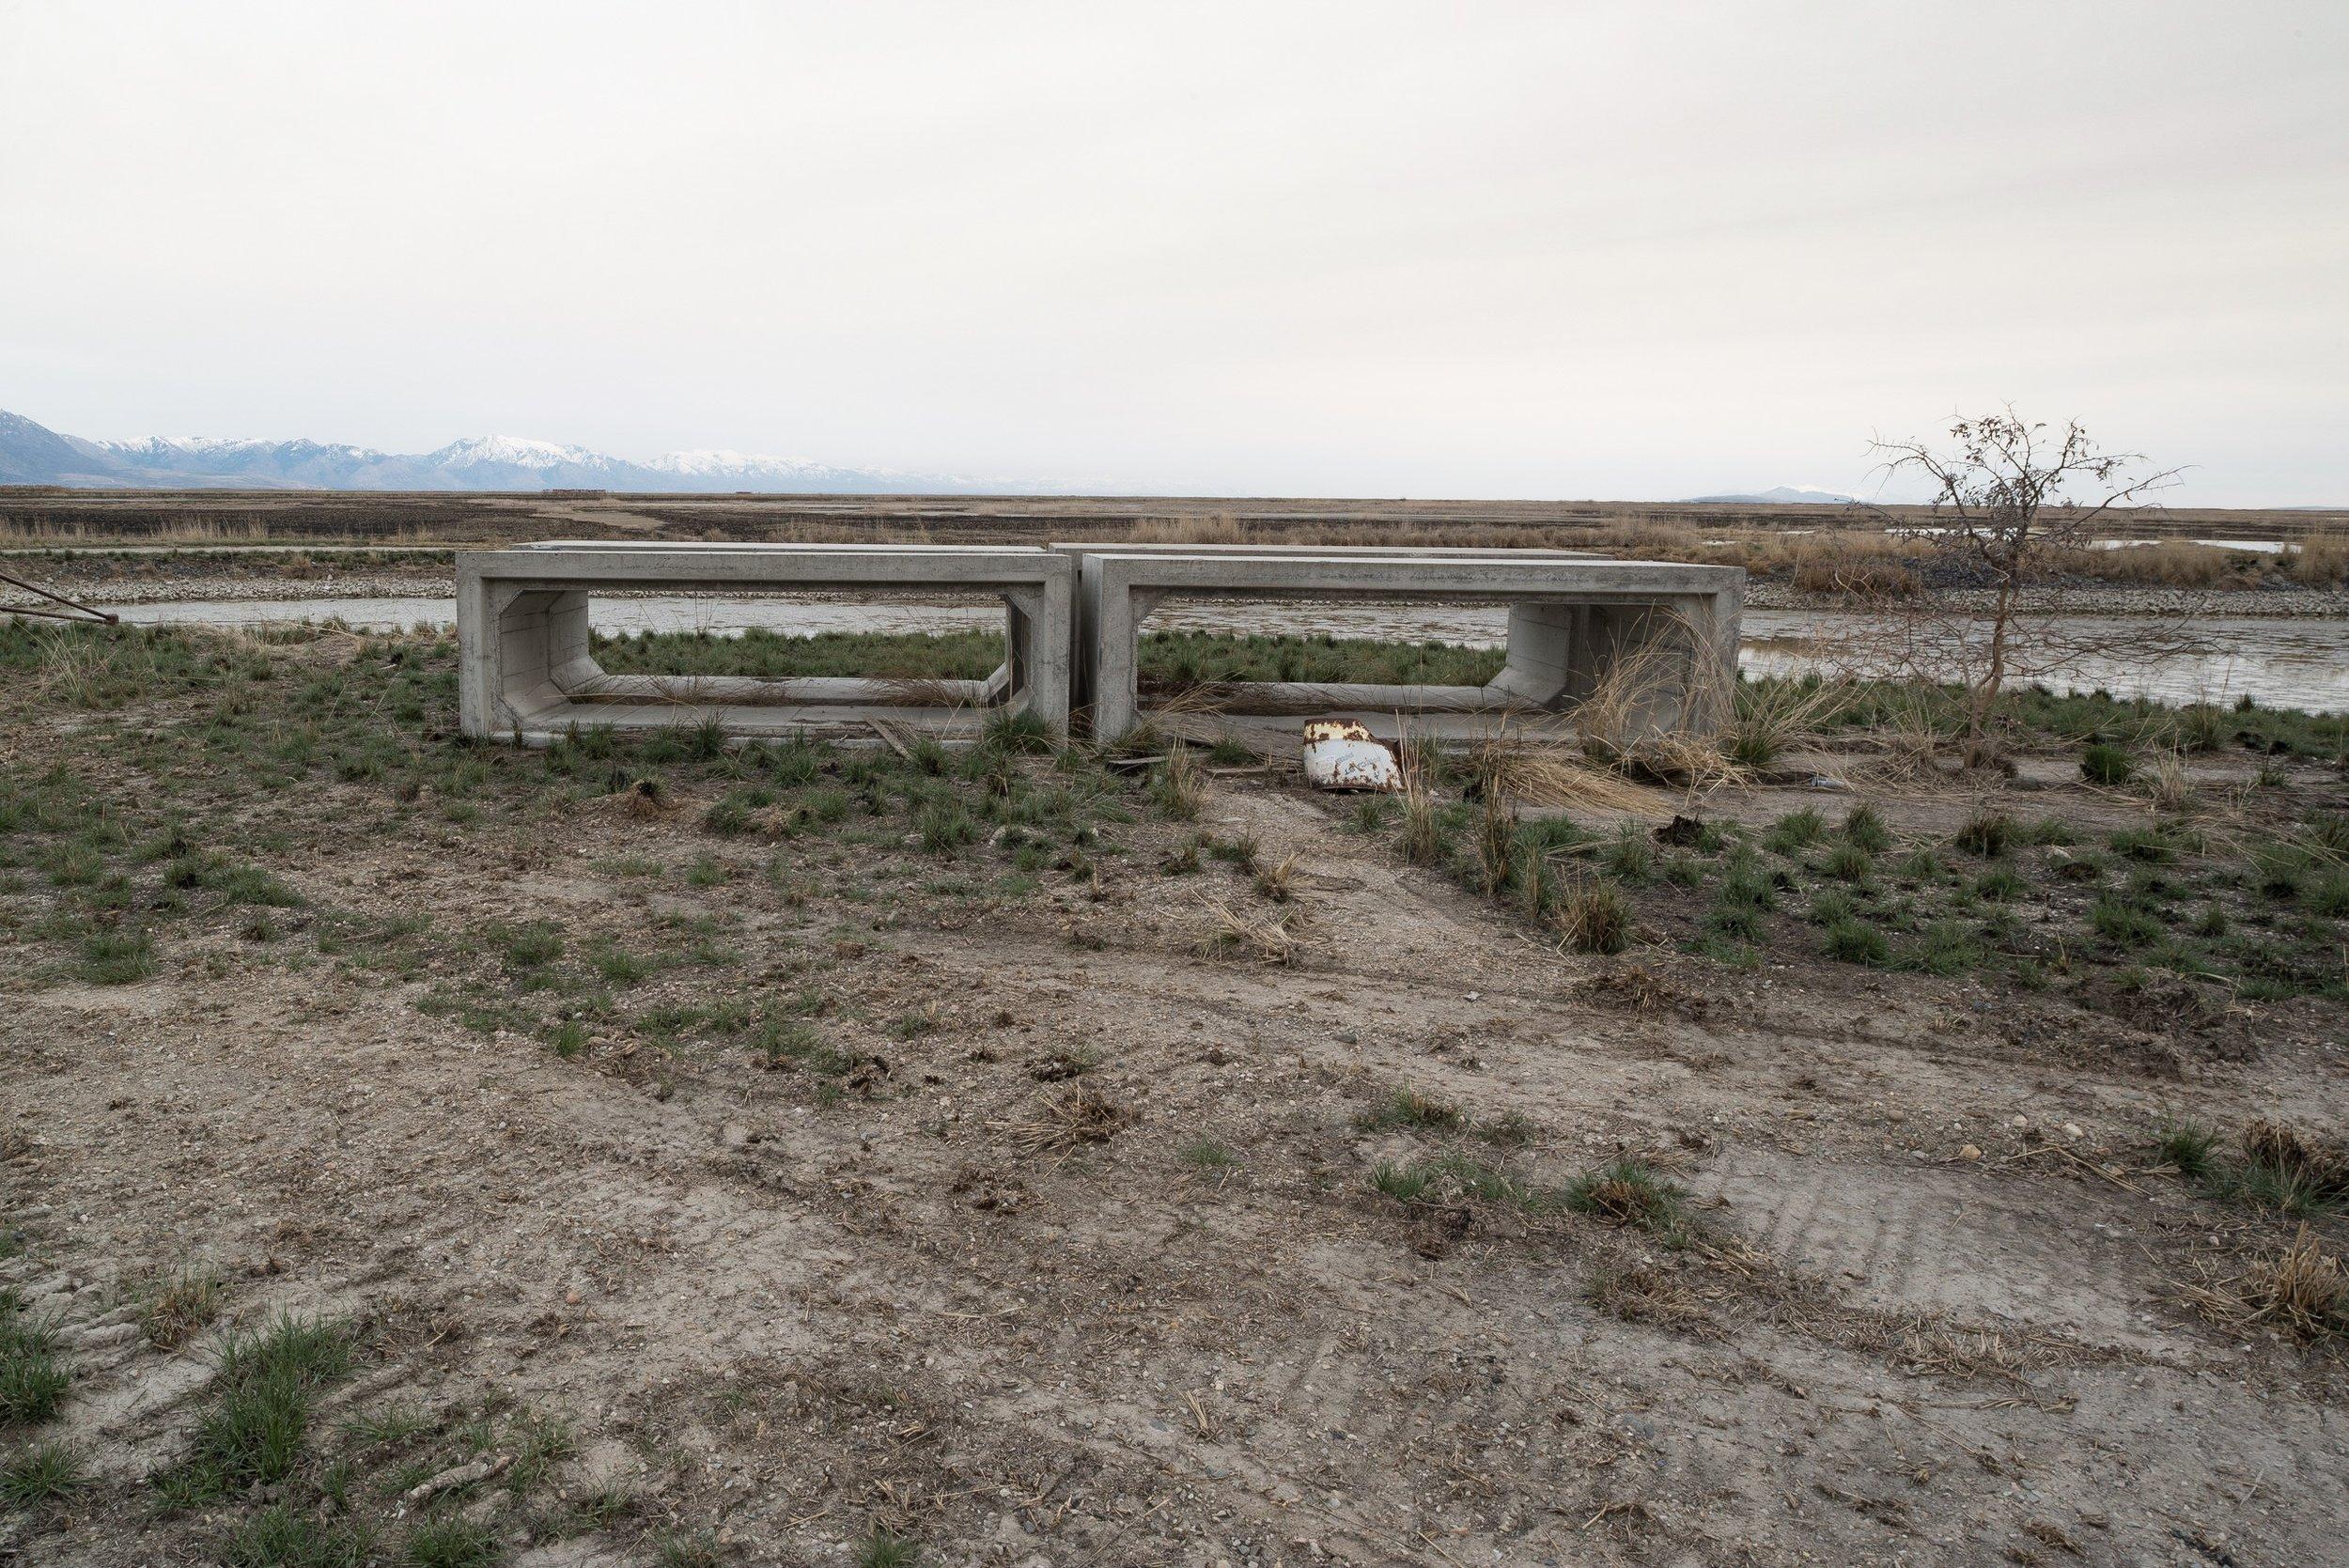 Cement Forms, Bear River Migratory Bird Refuge, Utah 2018